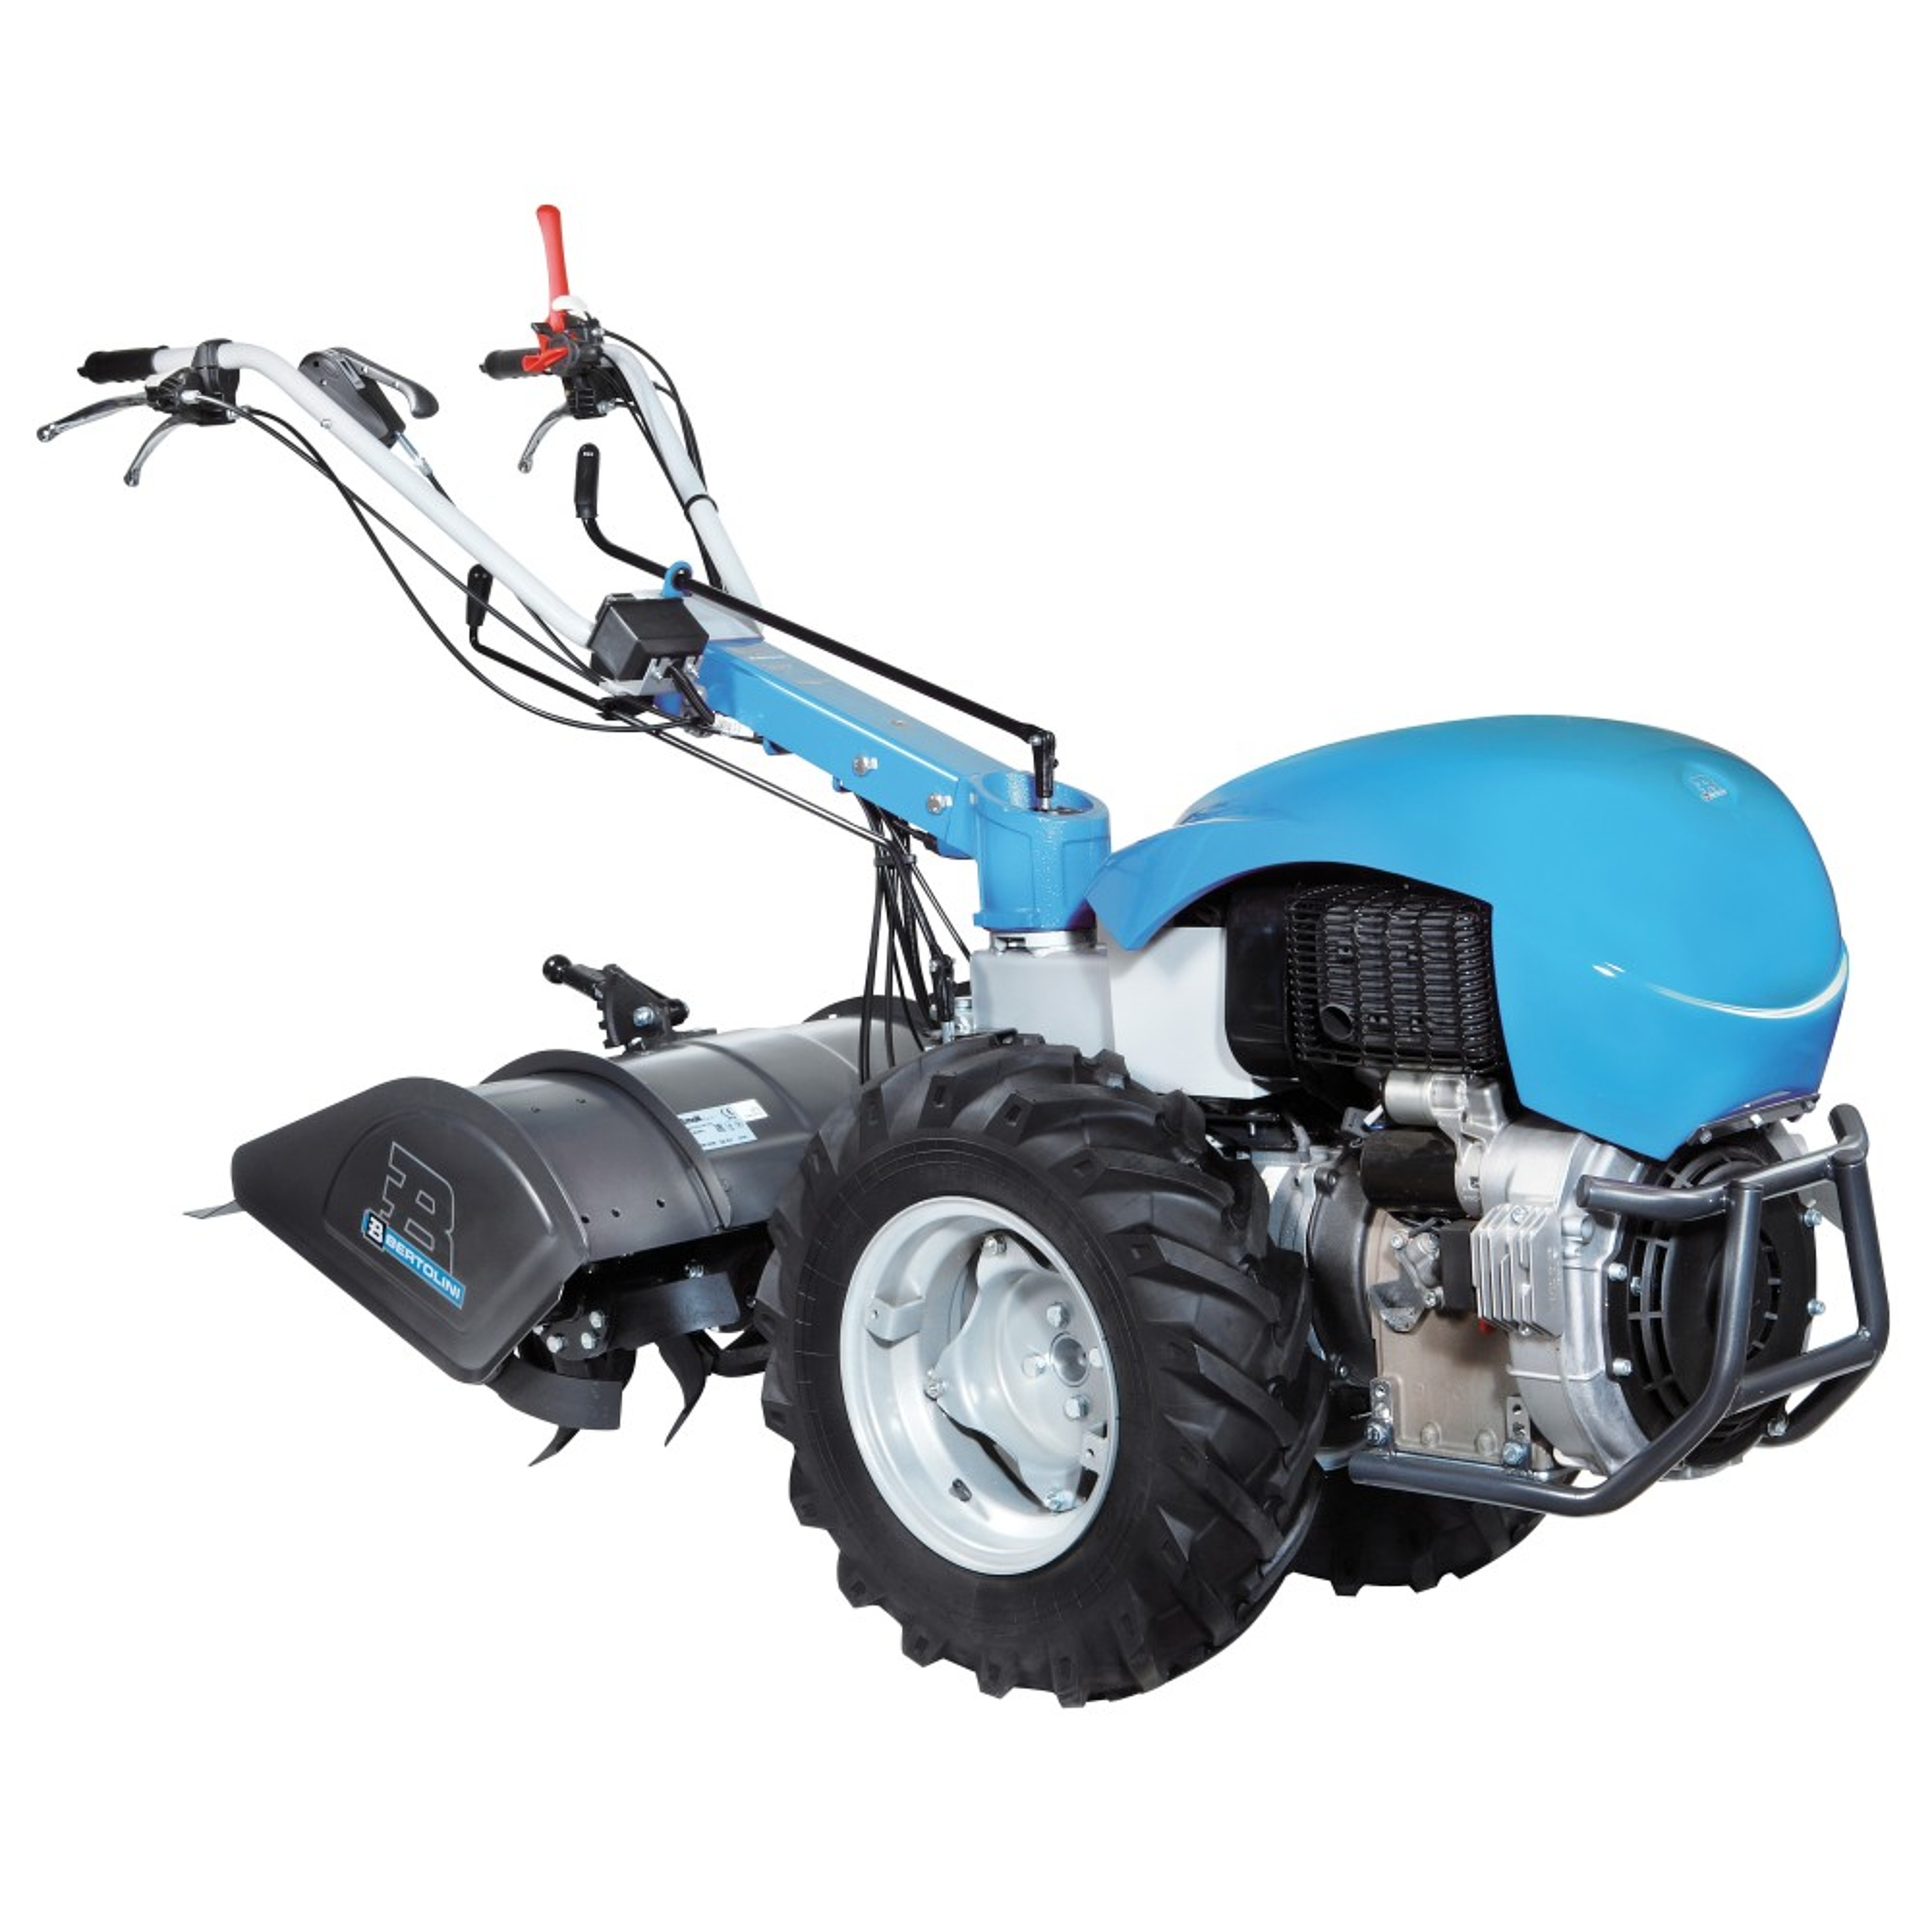 Bertolini Kultivátor Alapgép BT 417 S Lombardini 15LD440 motorral 68339120EN